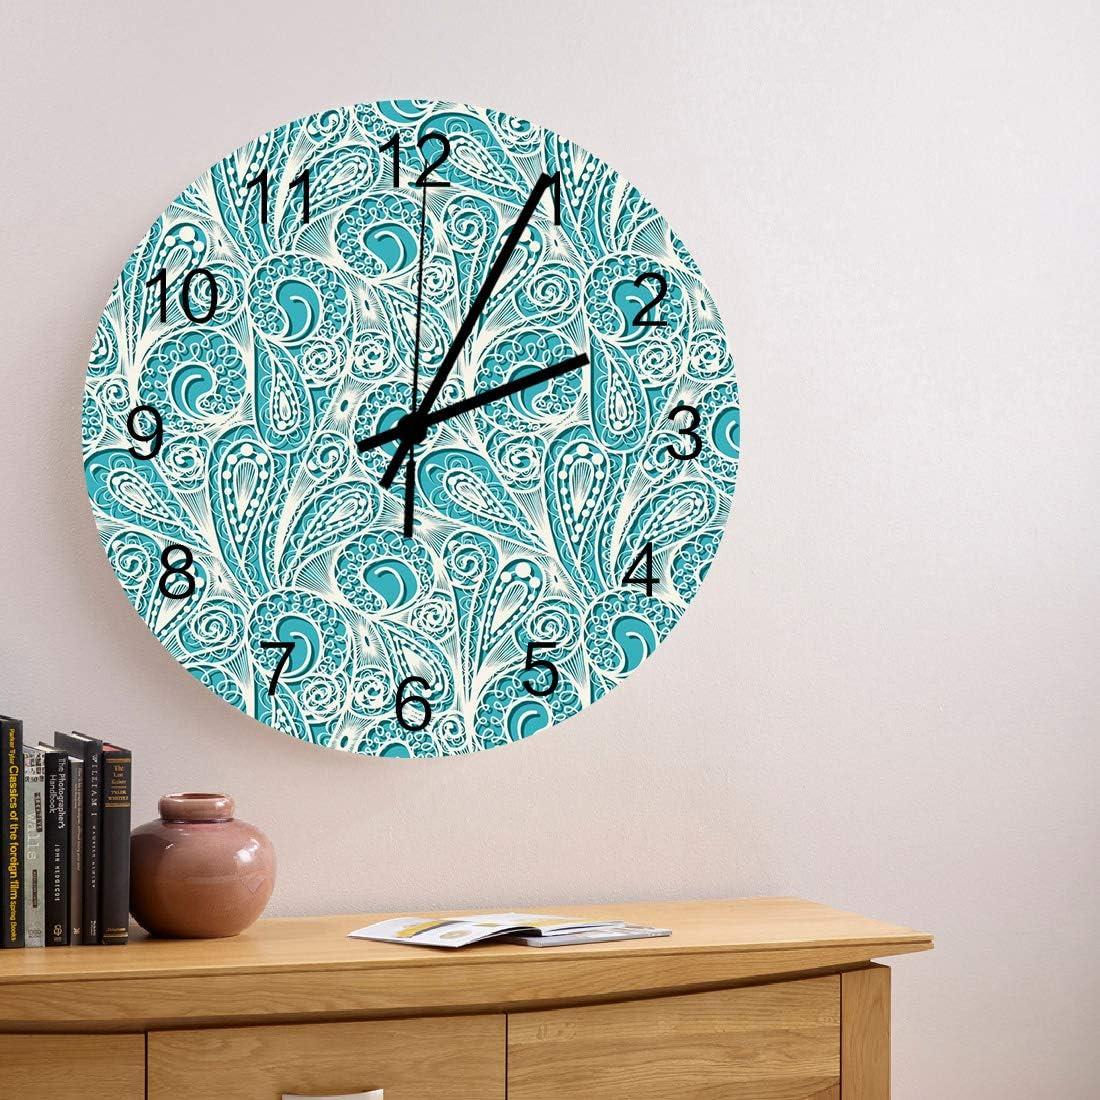 MuswannaA 12 Inch Max 86% OFF Round Wooden Pattern Cheap bargain Wall Clock Beige Flowers